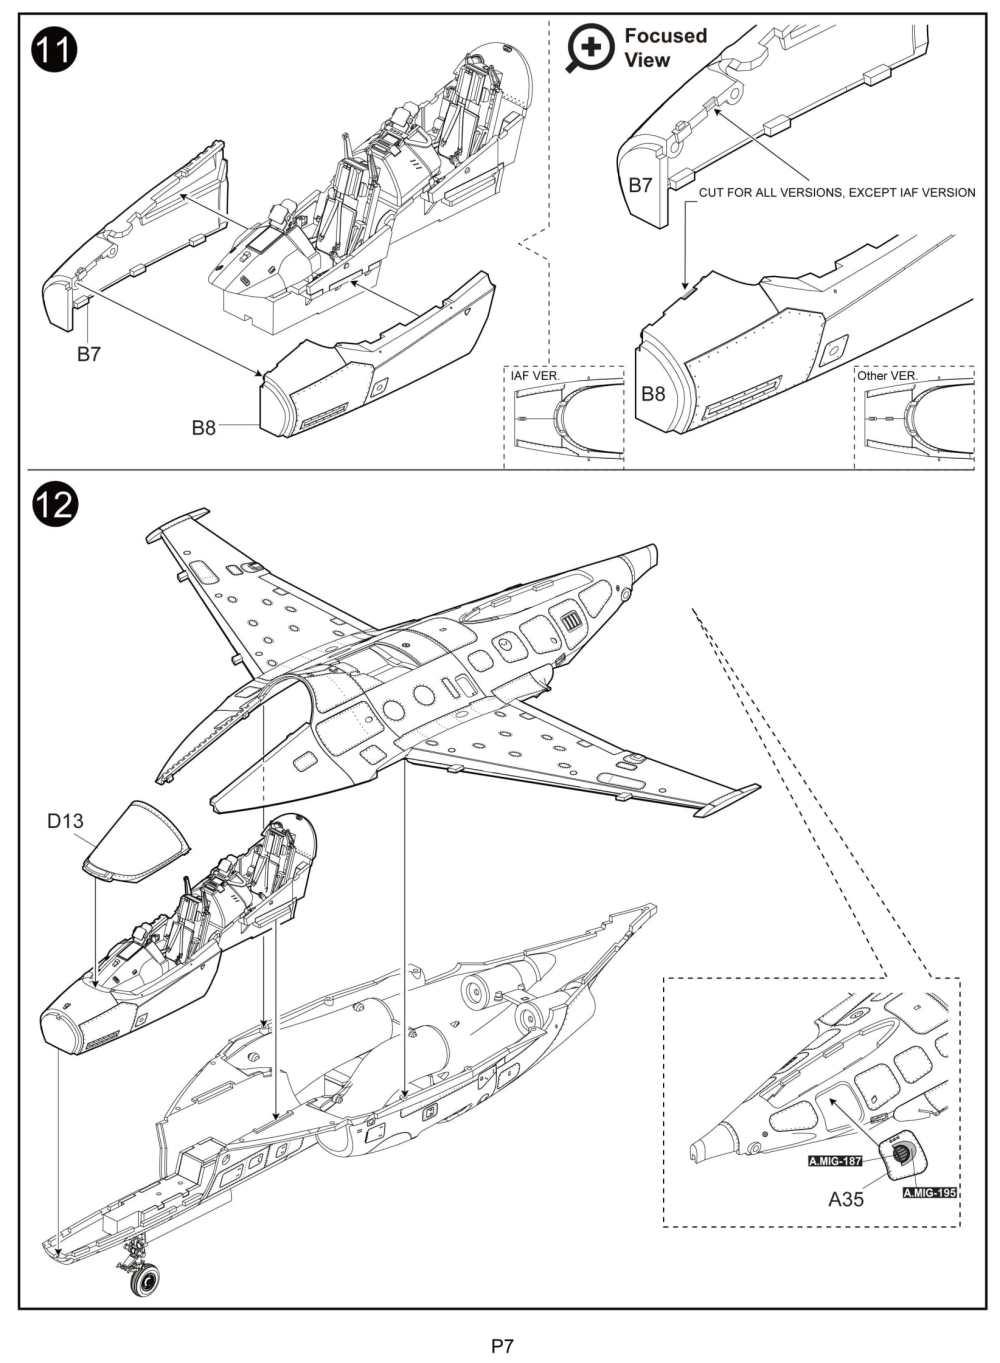 medium resolution of 48 m 346 master advanced fighter trainer ki k48063 full